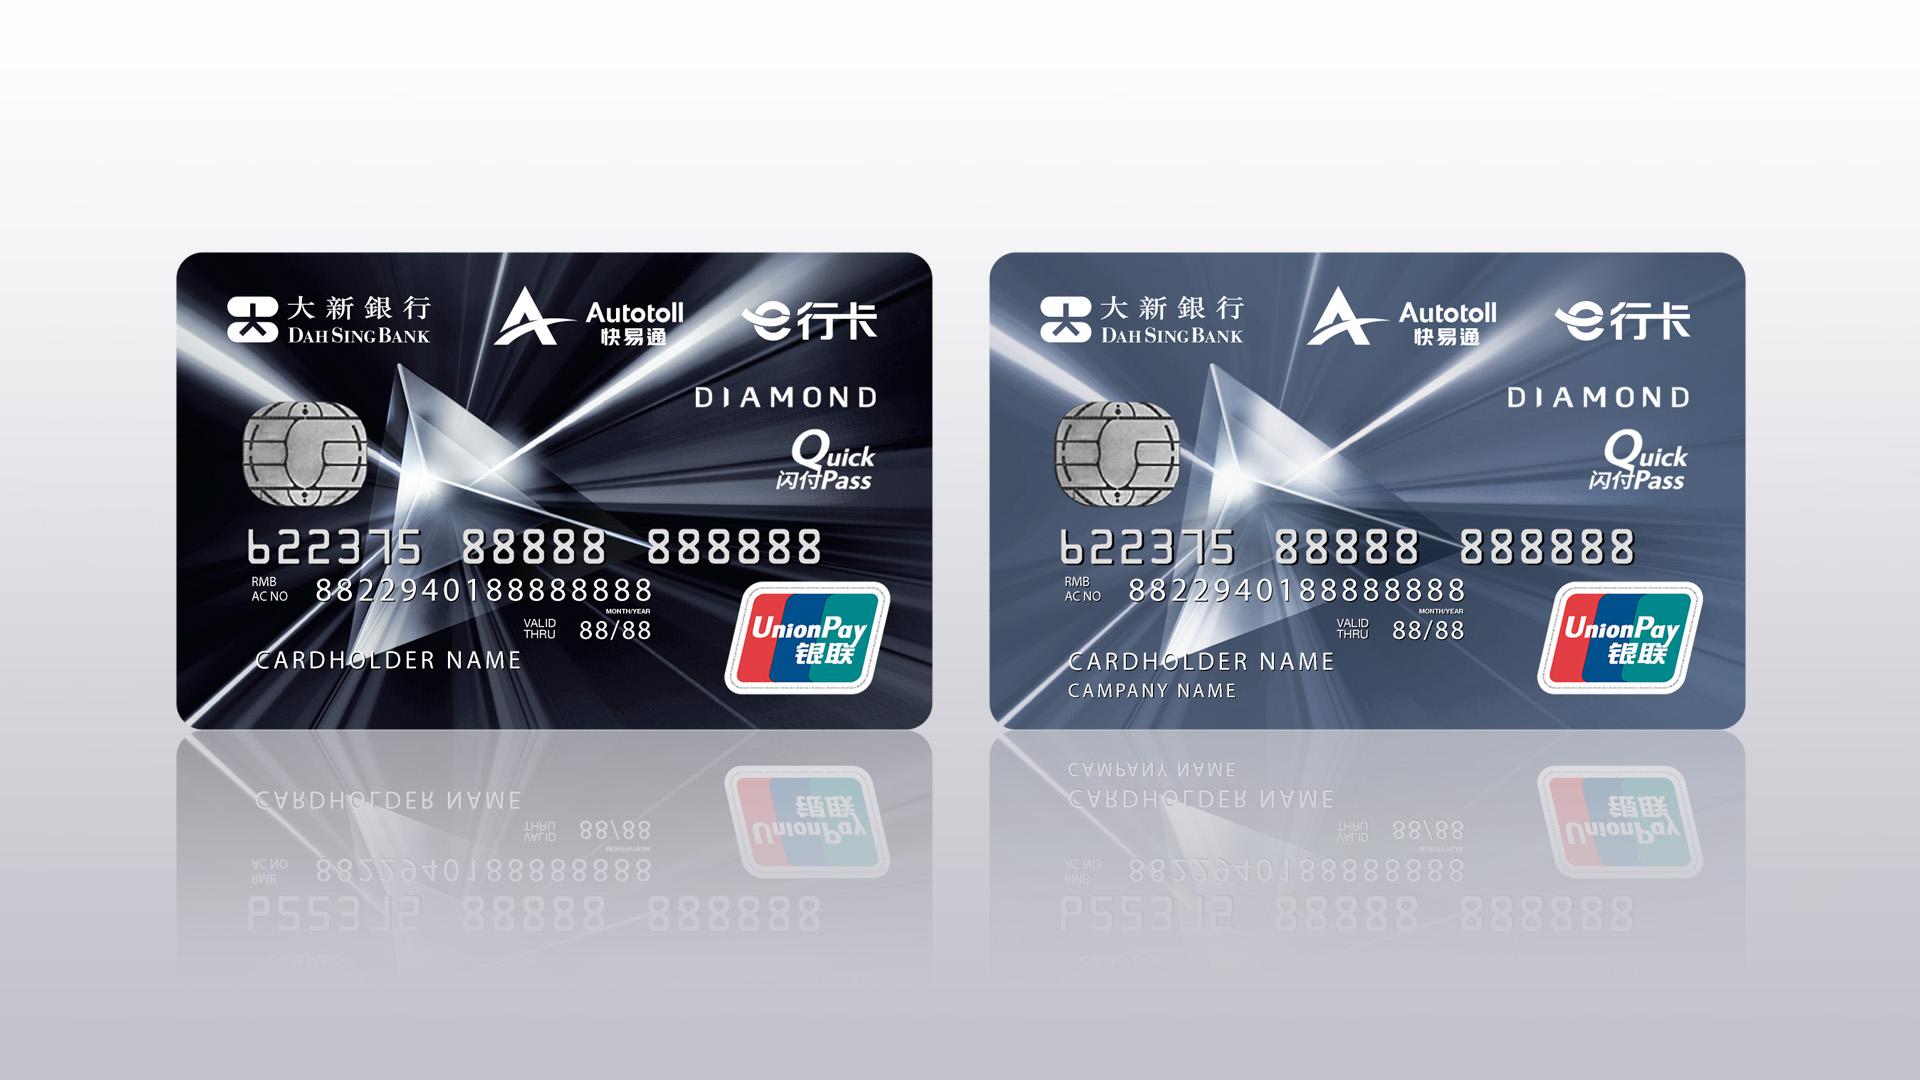 Dah Sing Autotoll E-Serve Credit Card Design